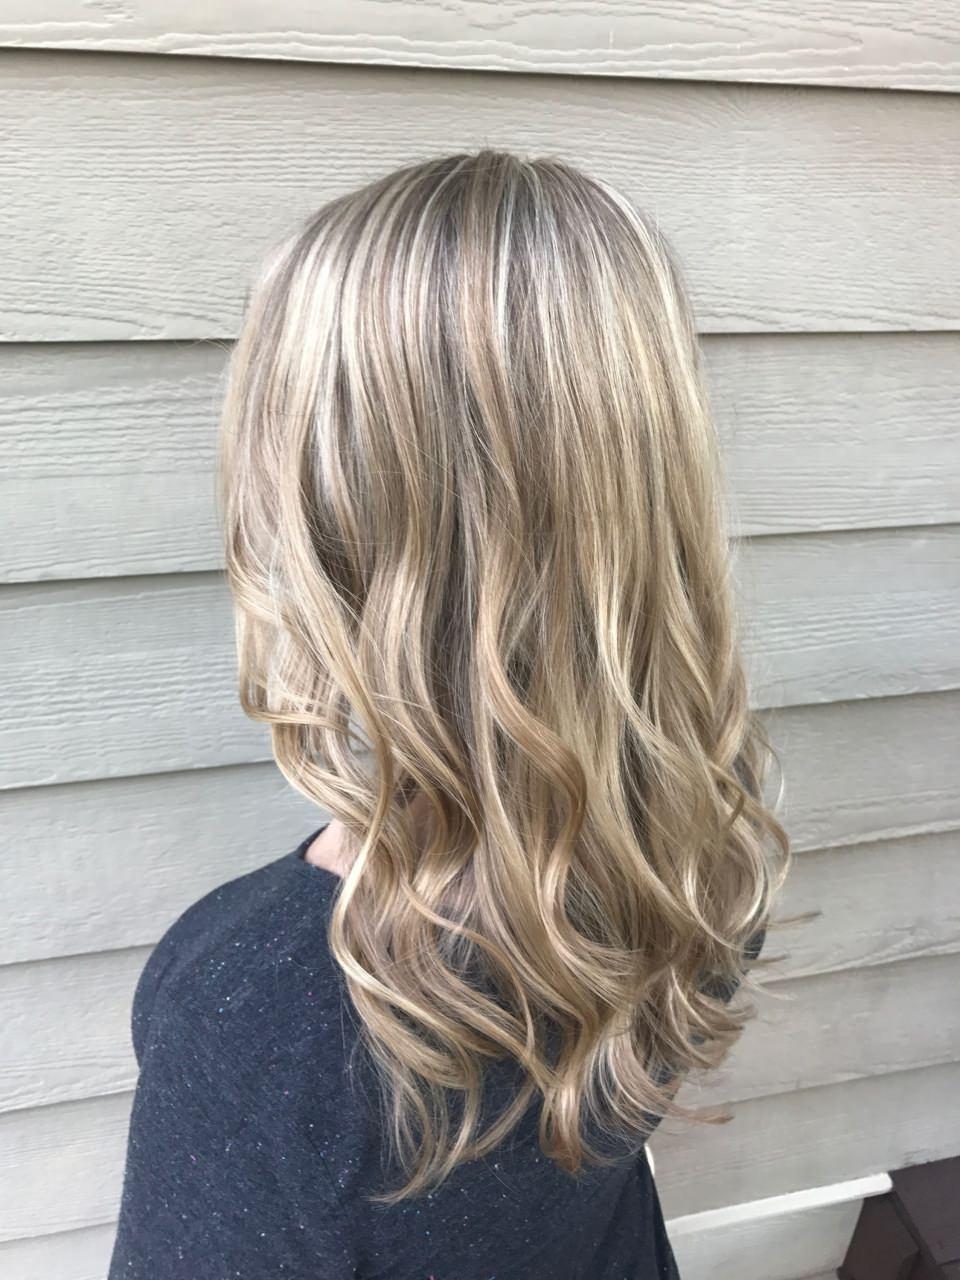 Medium Brown Hair With Blonde Highlights Hair Colours For Asians for Asian Hair With Blonde Highlights